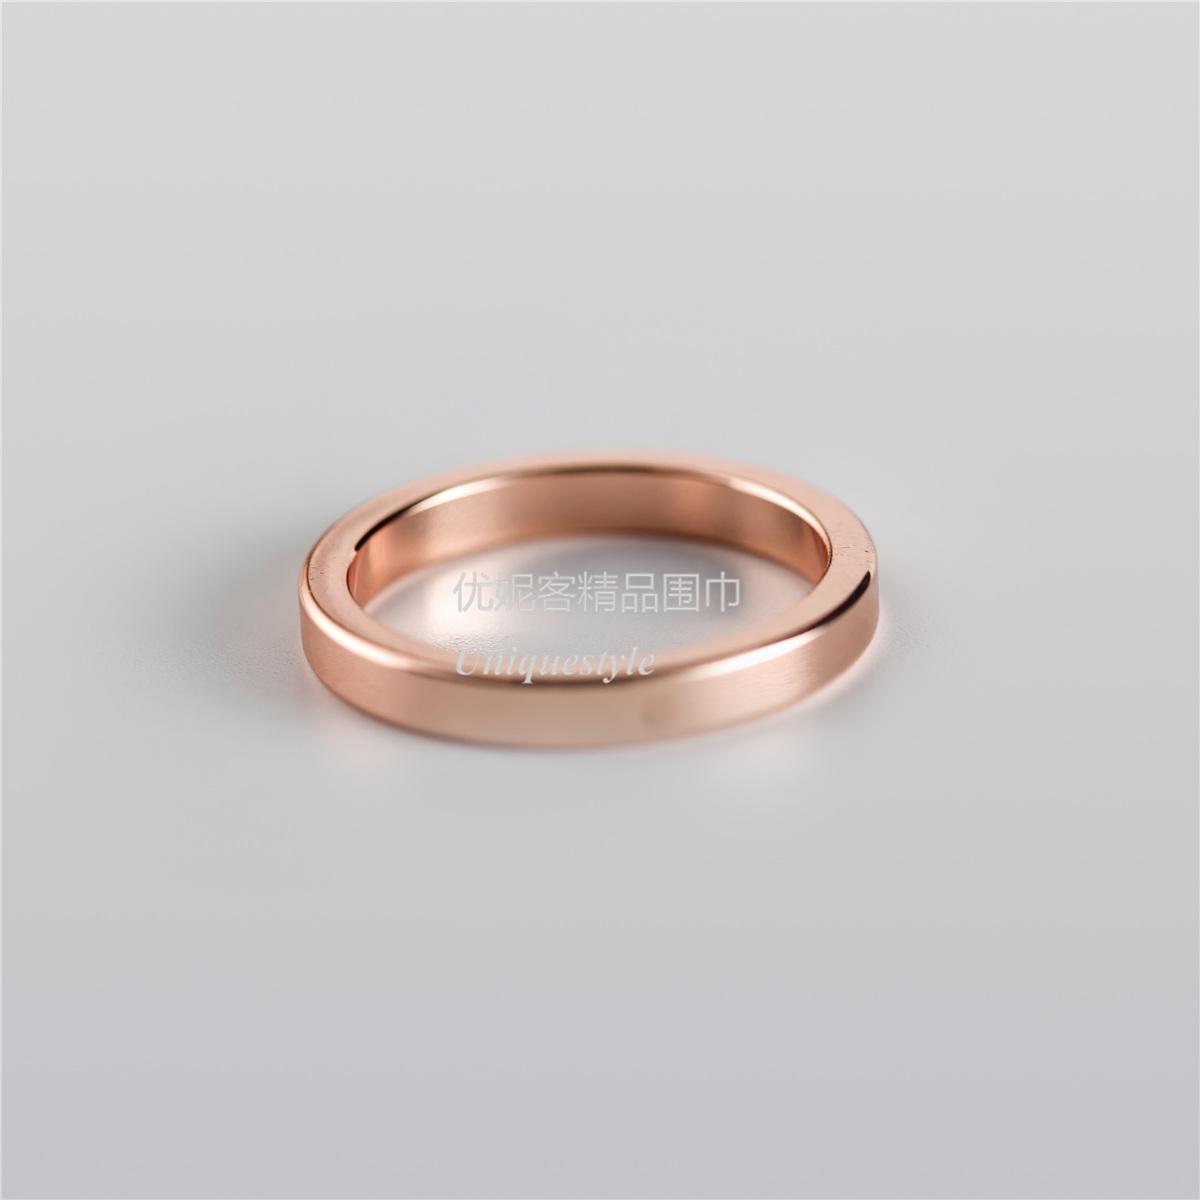 Цвет: Одно кольцо розовое золото 2.1